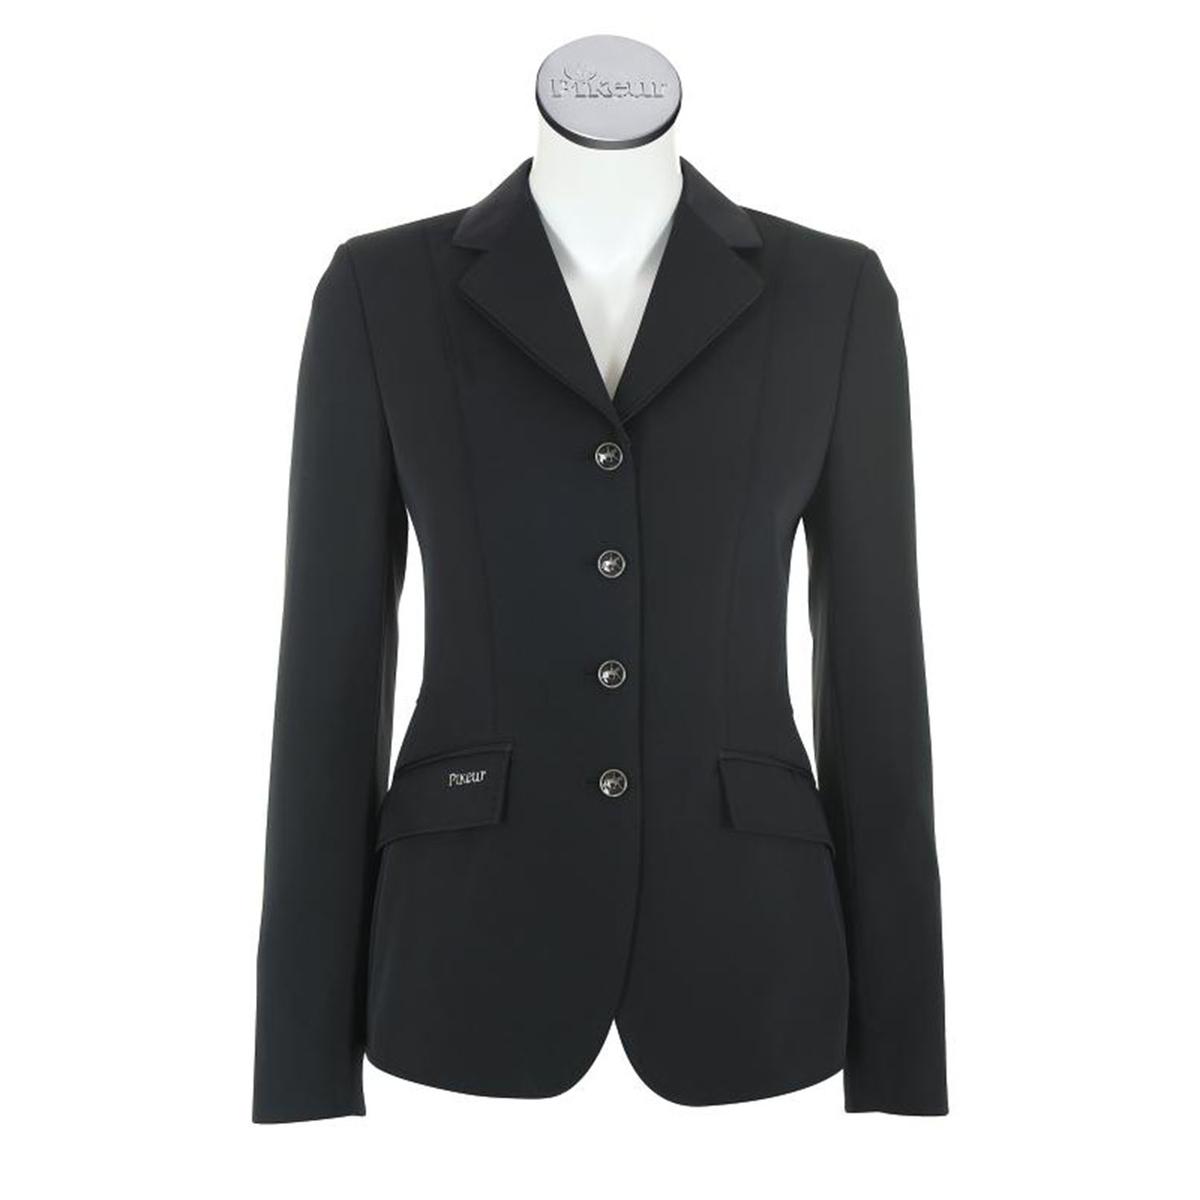 429a3514e01d Find 0853 dame modell. Shop every store on the internet via PricePi.com